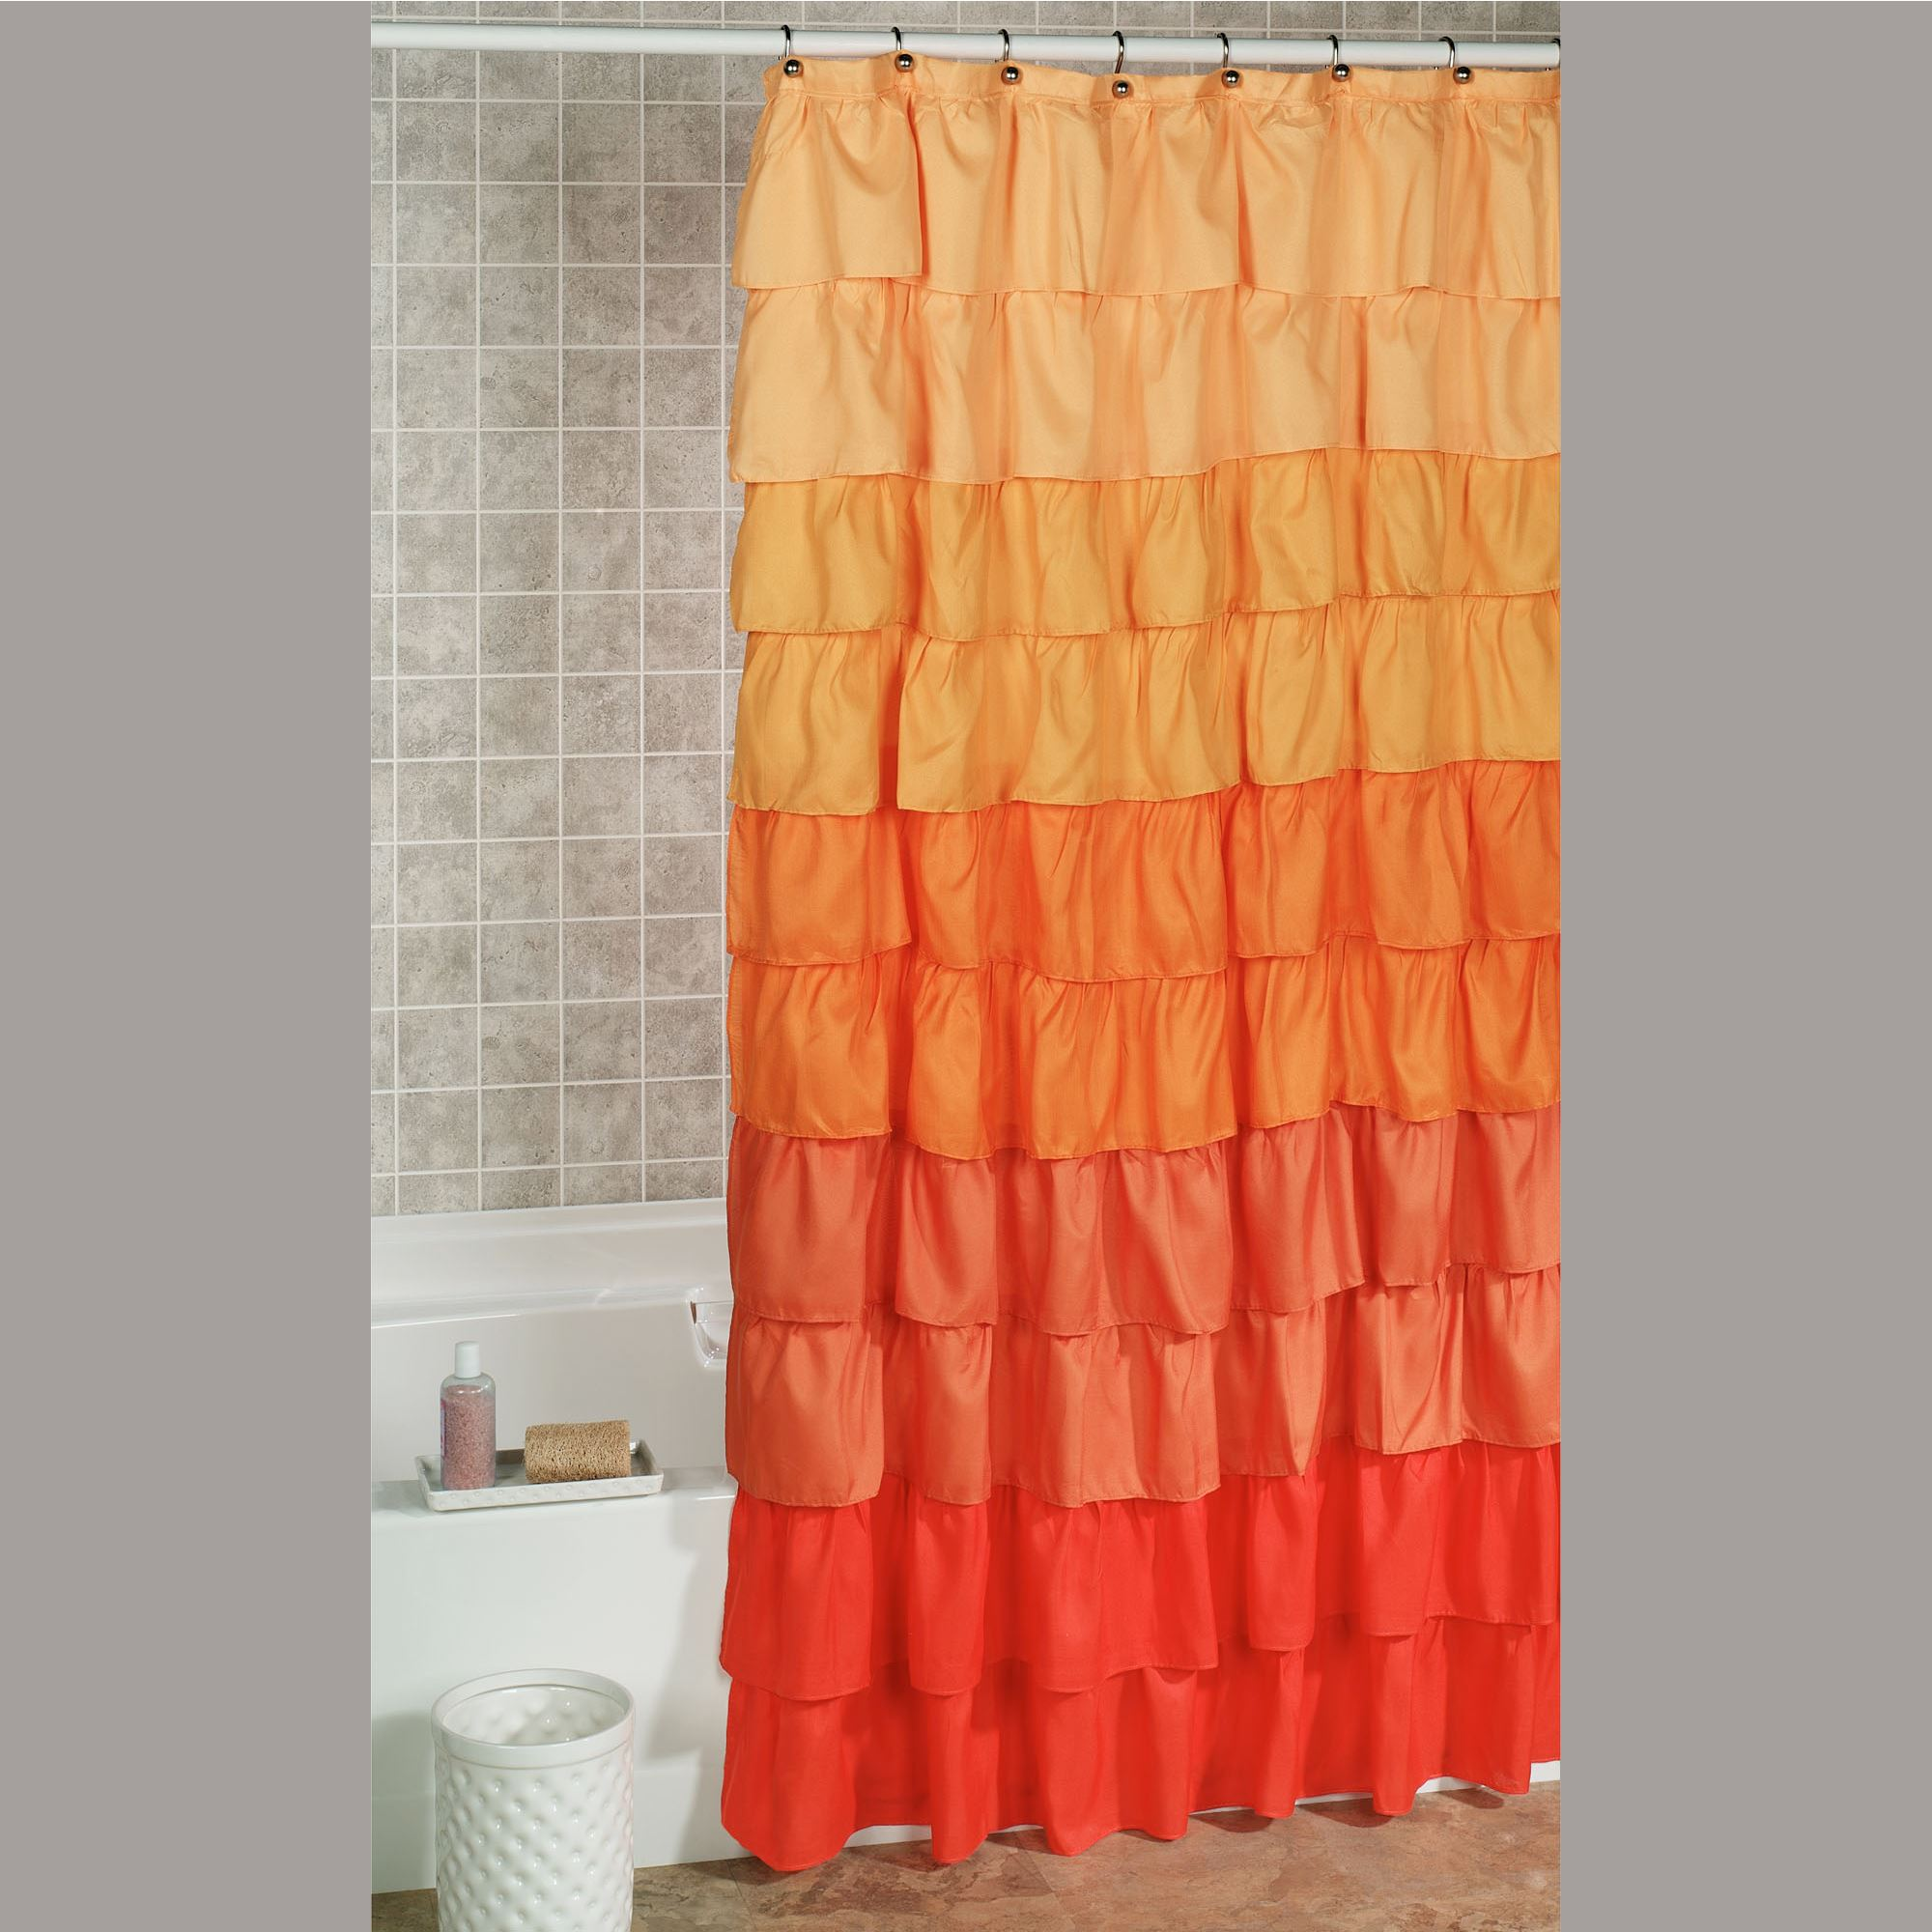 Maribella Vermillion Ombre Ruffled Shower Curtain